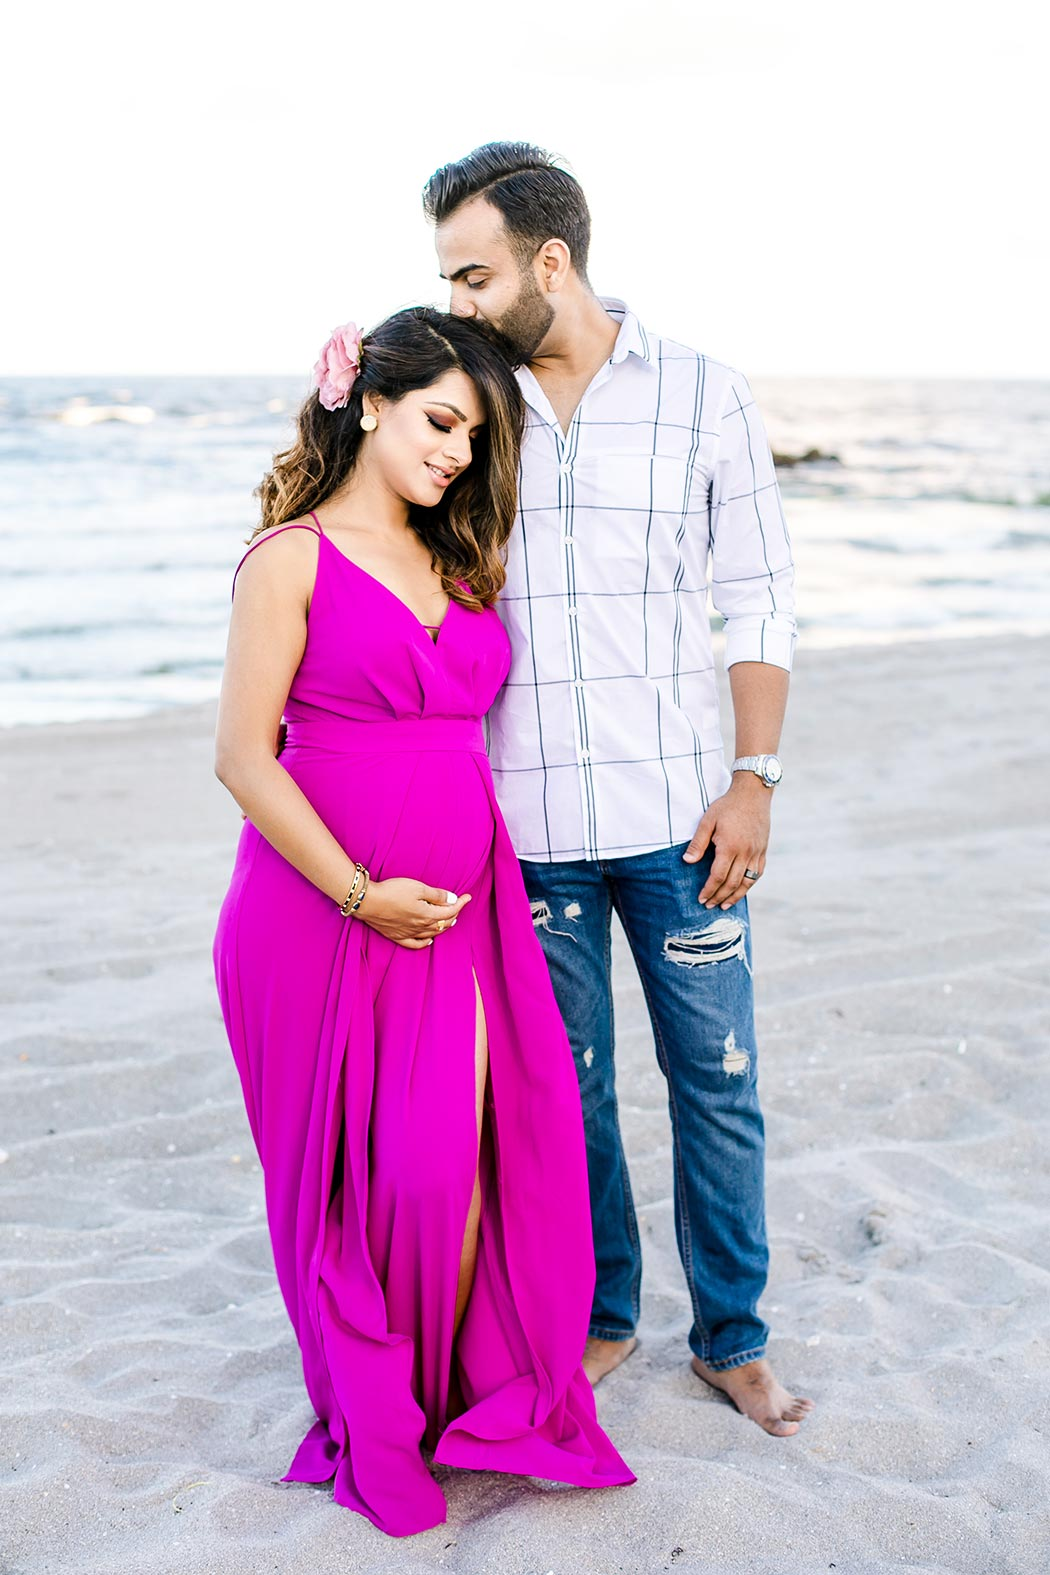 beach sunset maternity photoshoot with couple   fort lauderdale maternity photographer